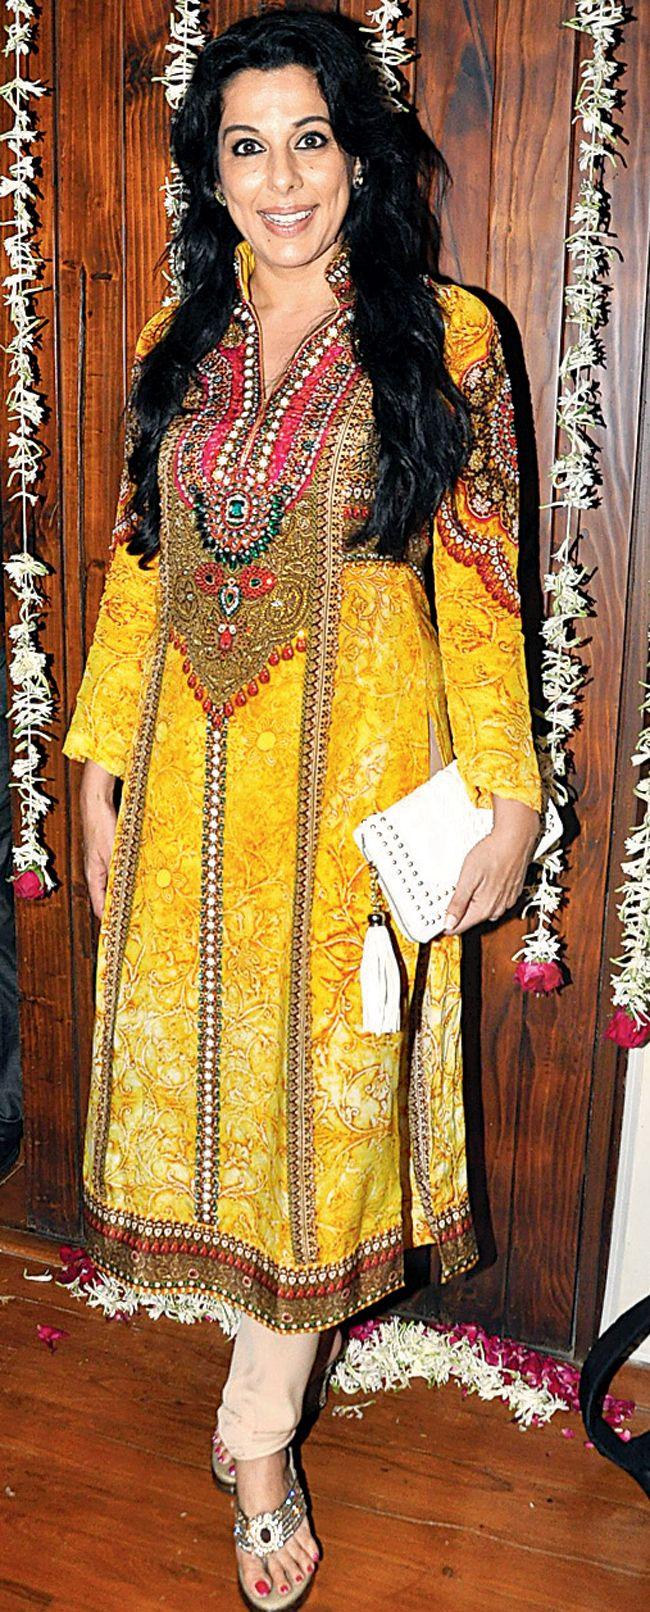 Pooja Bedi at Jaaved Jafferi's Eid bash #Style #Bollywood #Fashion #Beauty